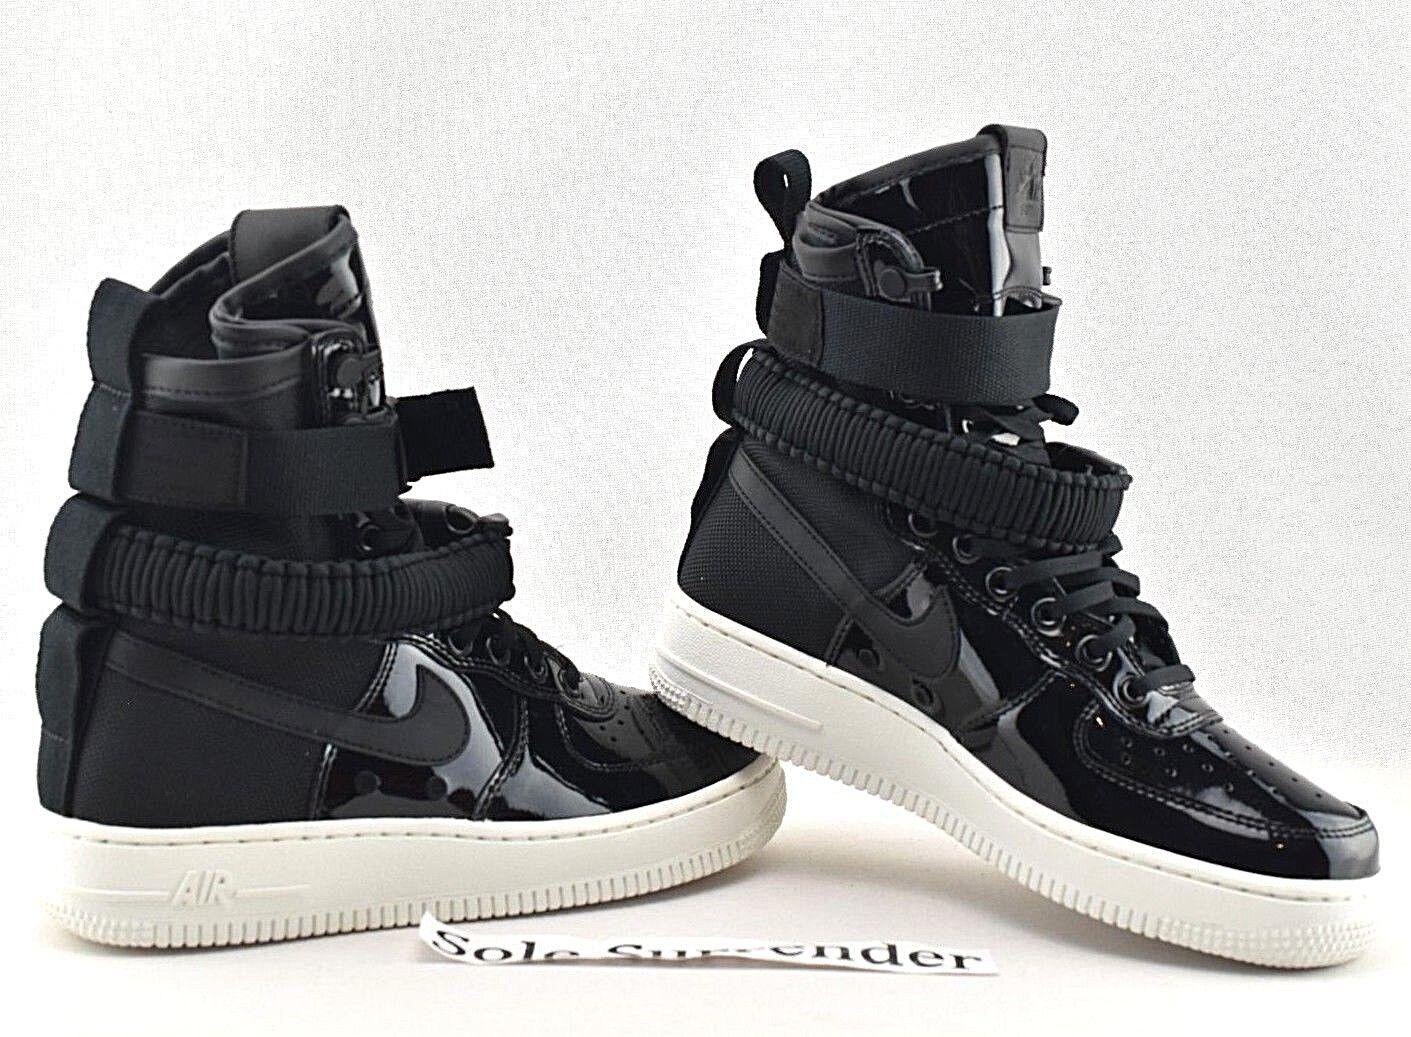 Nike SF Air Force 1 Special Field Af1 High Aj0963-001 Premium Black ... 7026ddff06